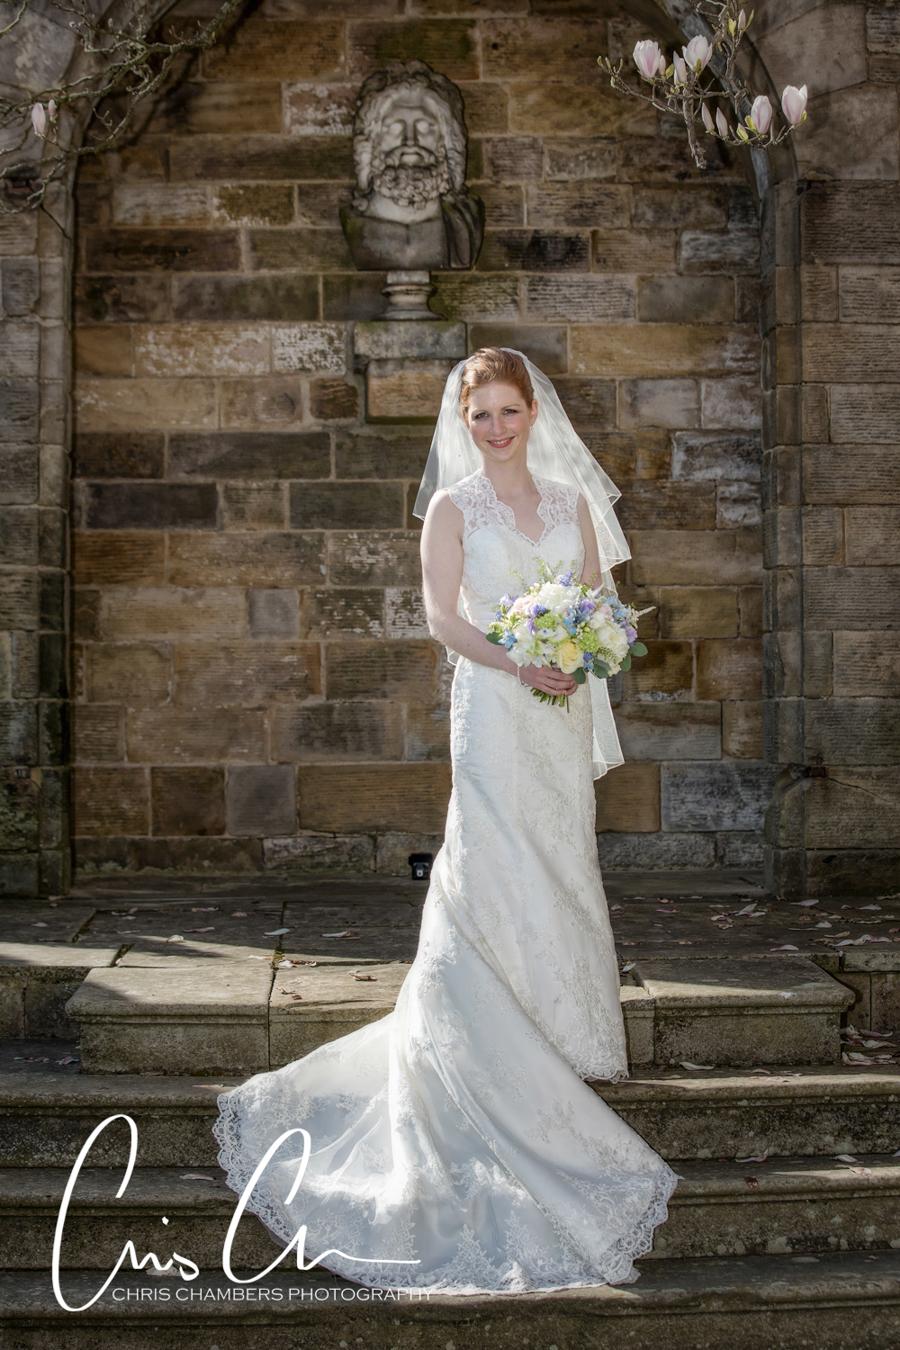 Rudding Park wedding photography, Yorkshire Wedding Photography, Rudding Park Wedding Photographs, North Yorkshire Wedding Photographer in Harrogate, Rudding Park Wedding Photography, Harrogate wedding photography